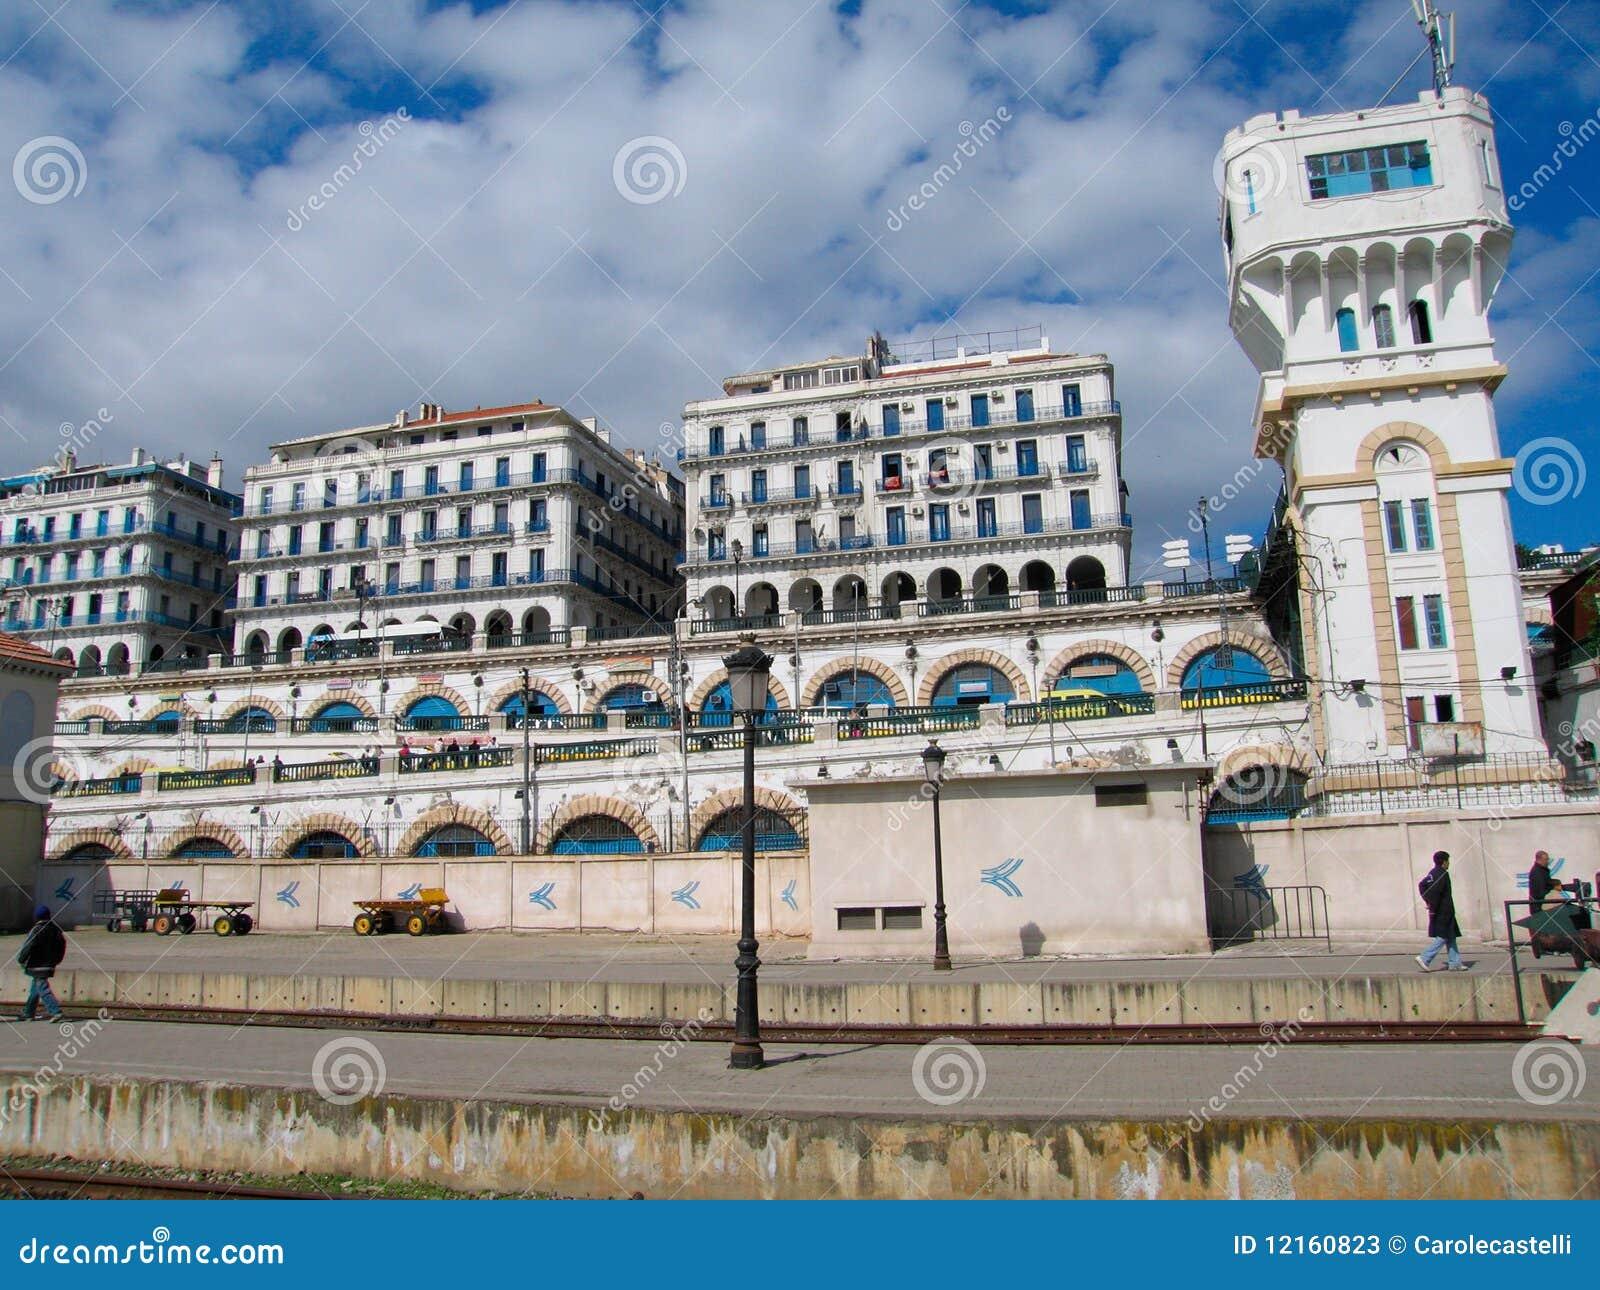 Algiers hauptstadt des algerien landes nordafrika